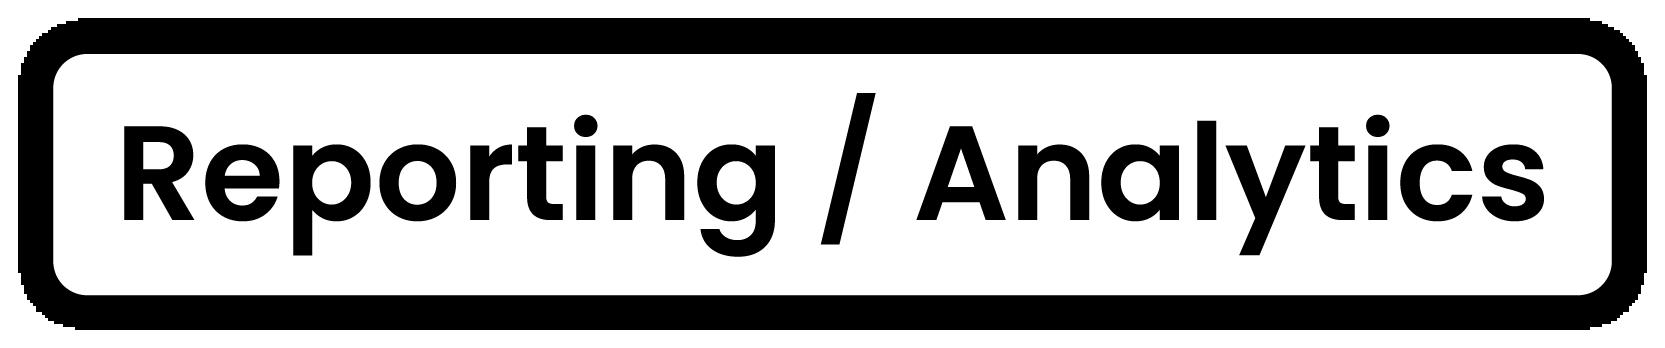 Development process label: Reporting/Analytics